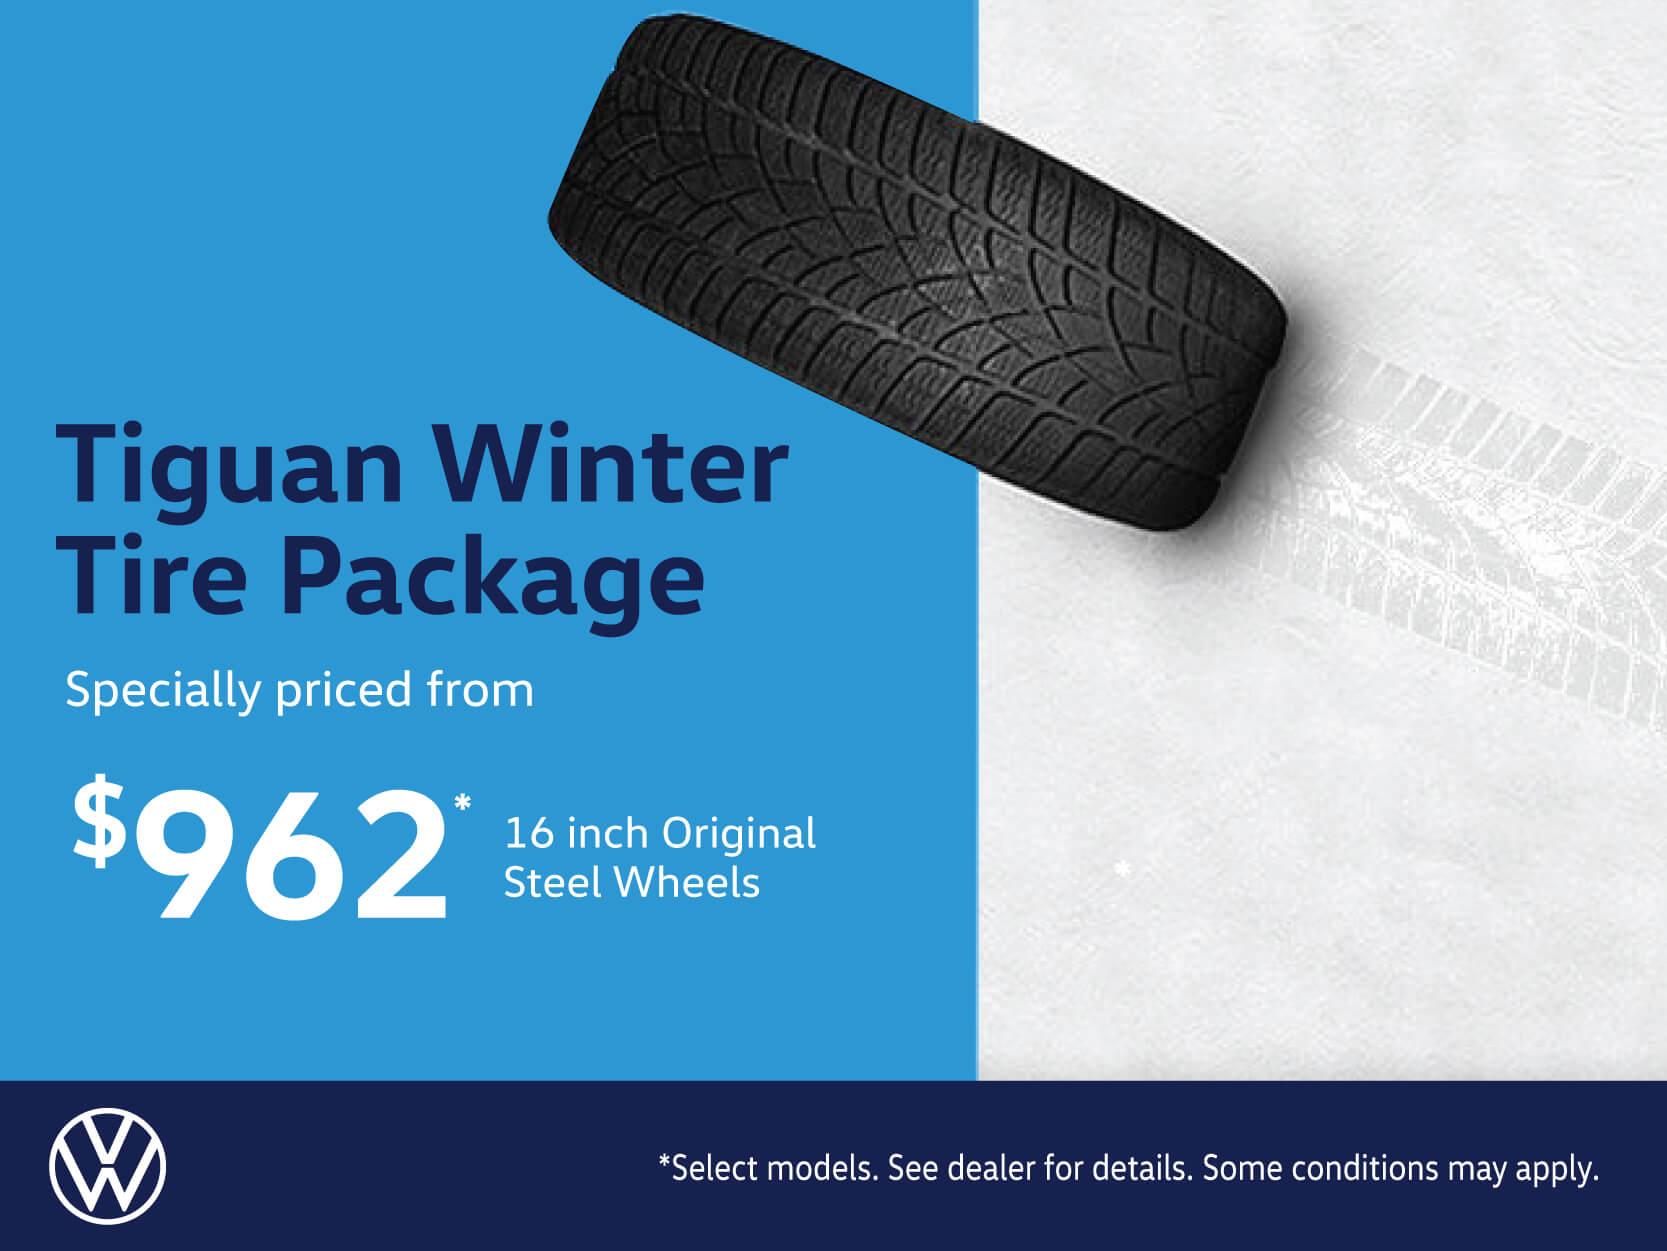 Tiguan Steel Winter Tire Package